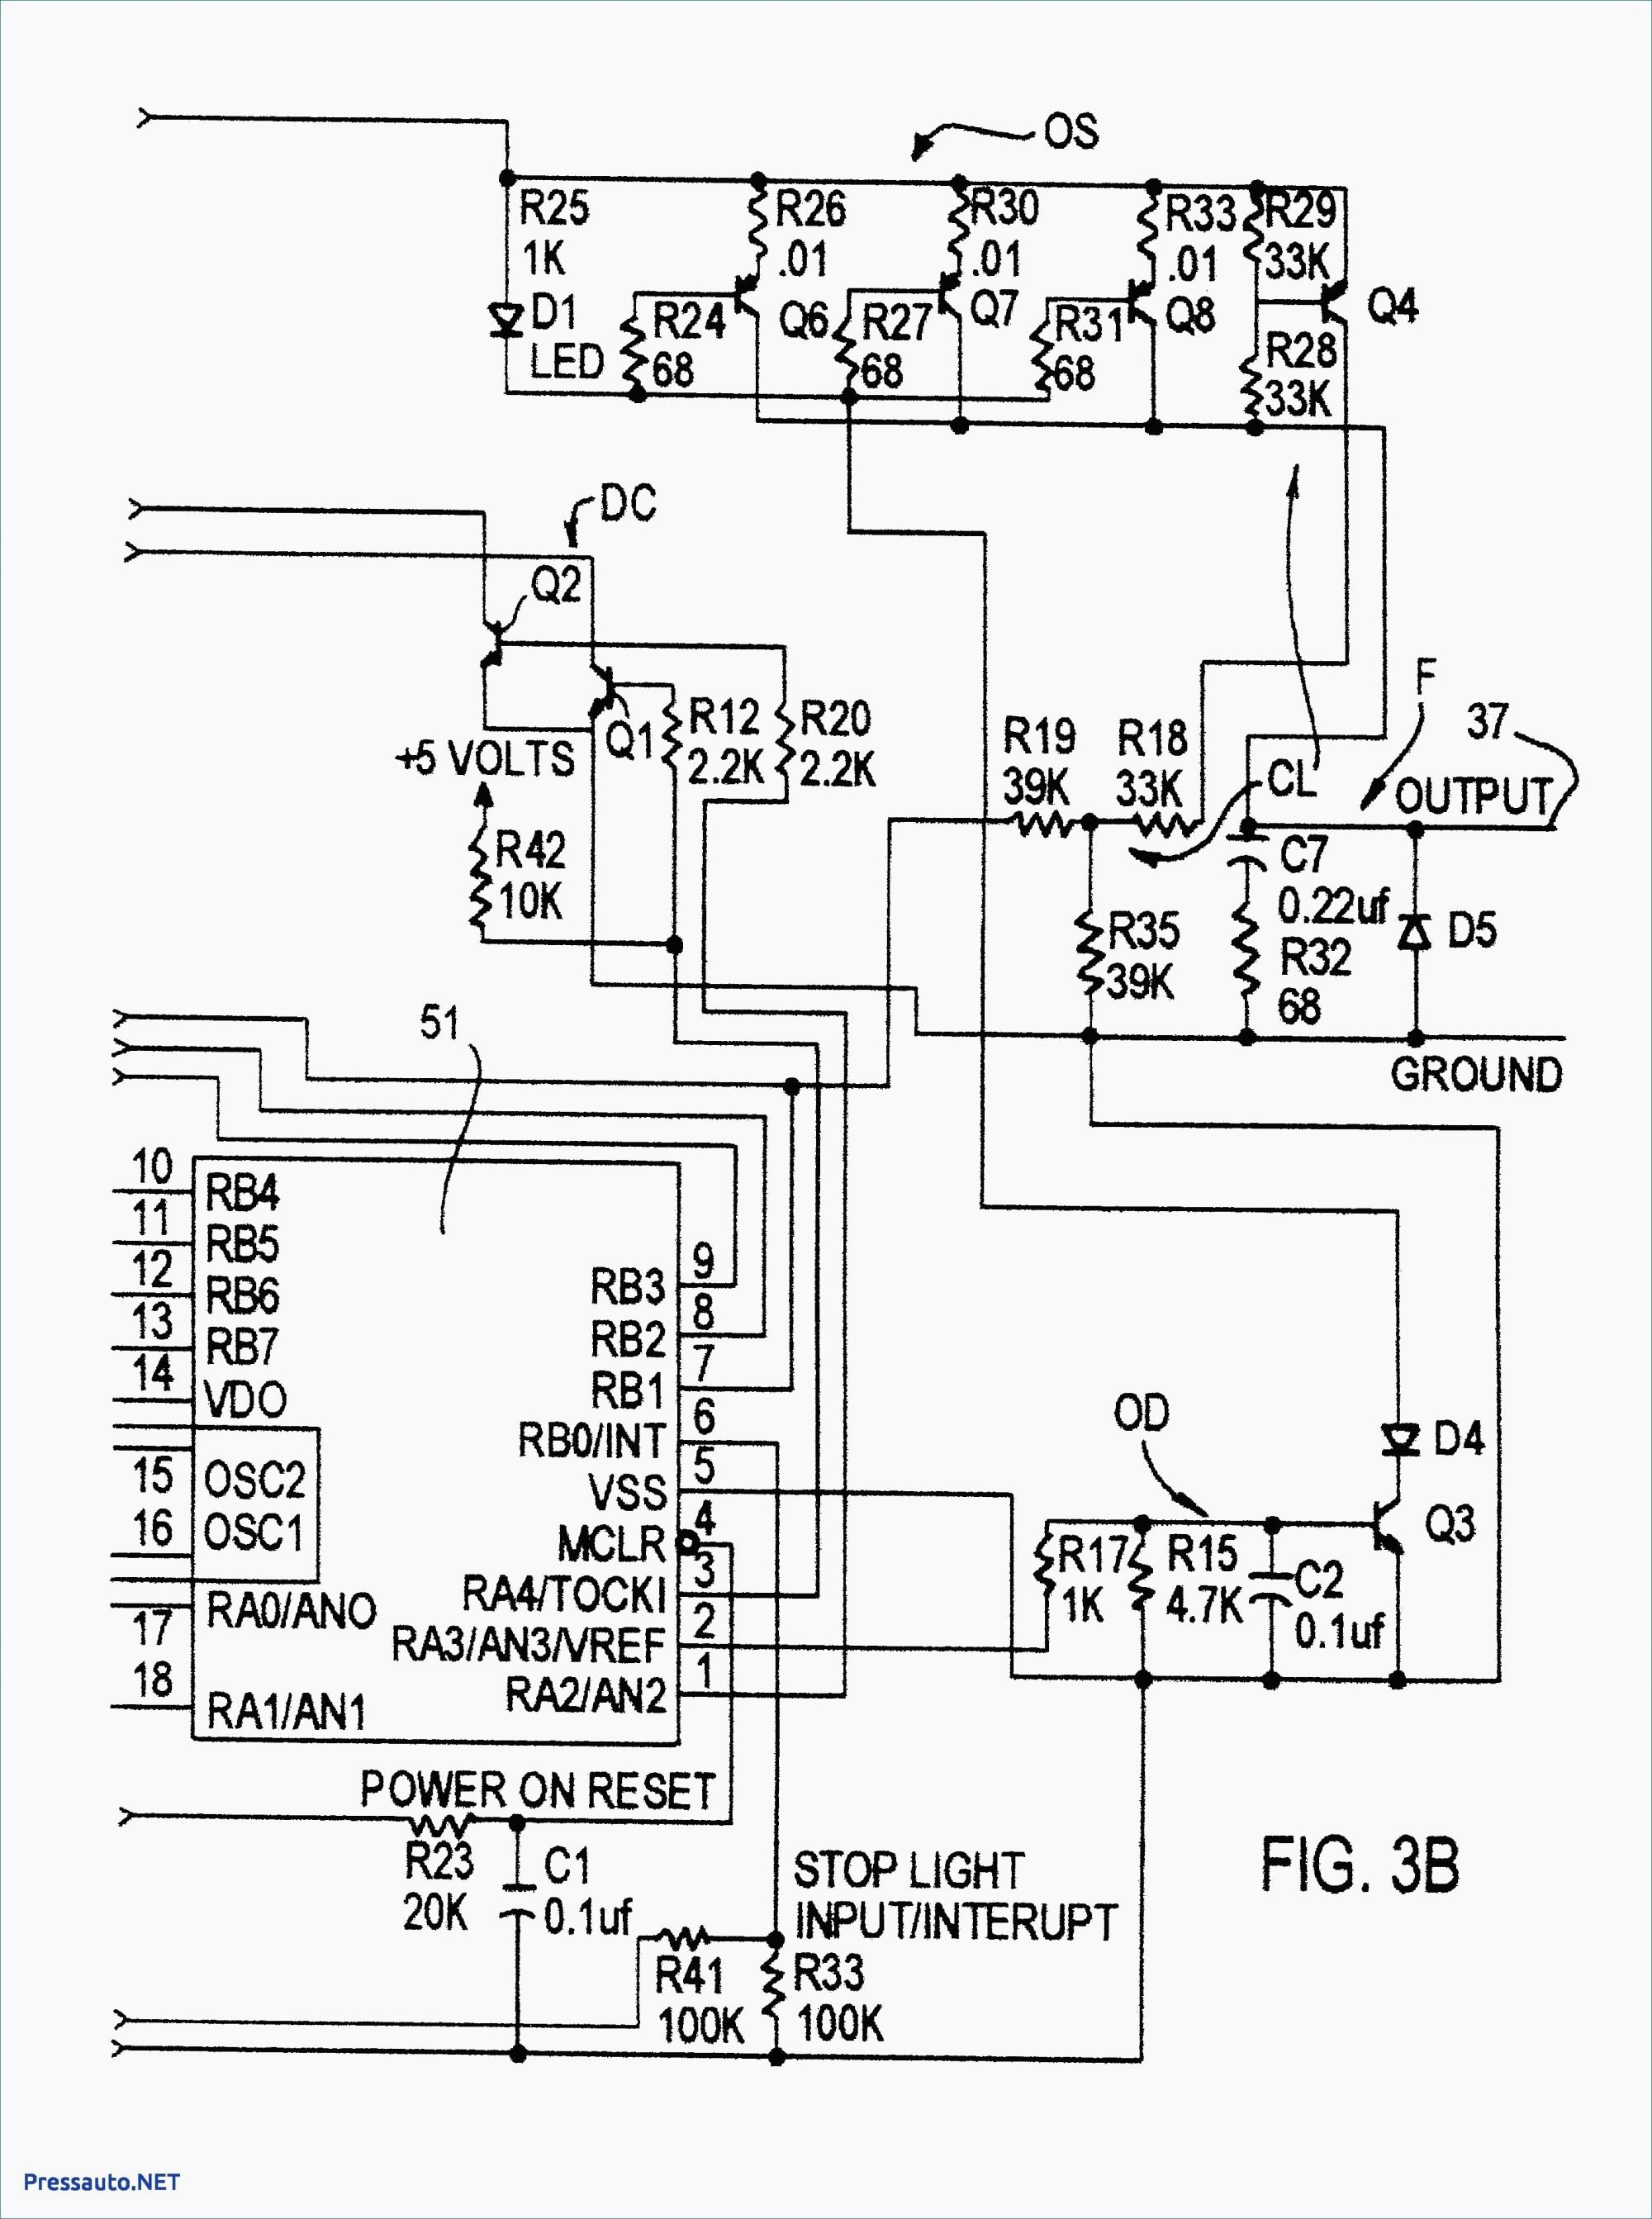 hight resolution of 57 chevy ez wiring diagram wiring diagram autovehicle57 chevy ez wiring diagram